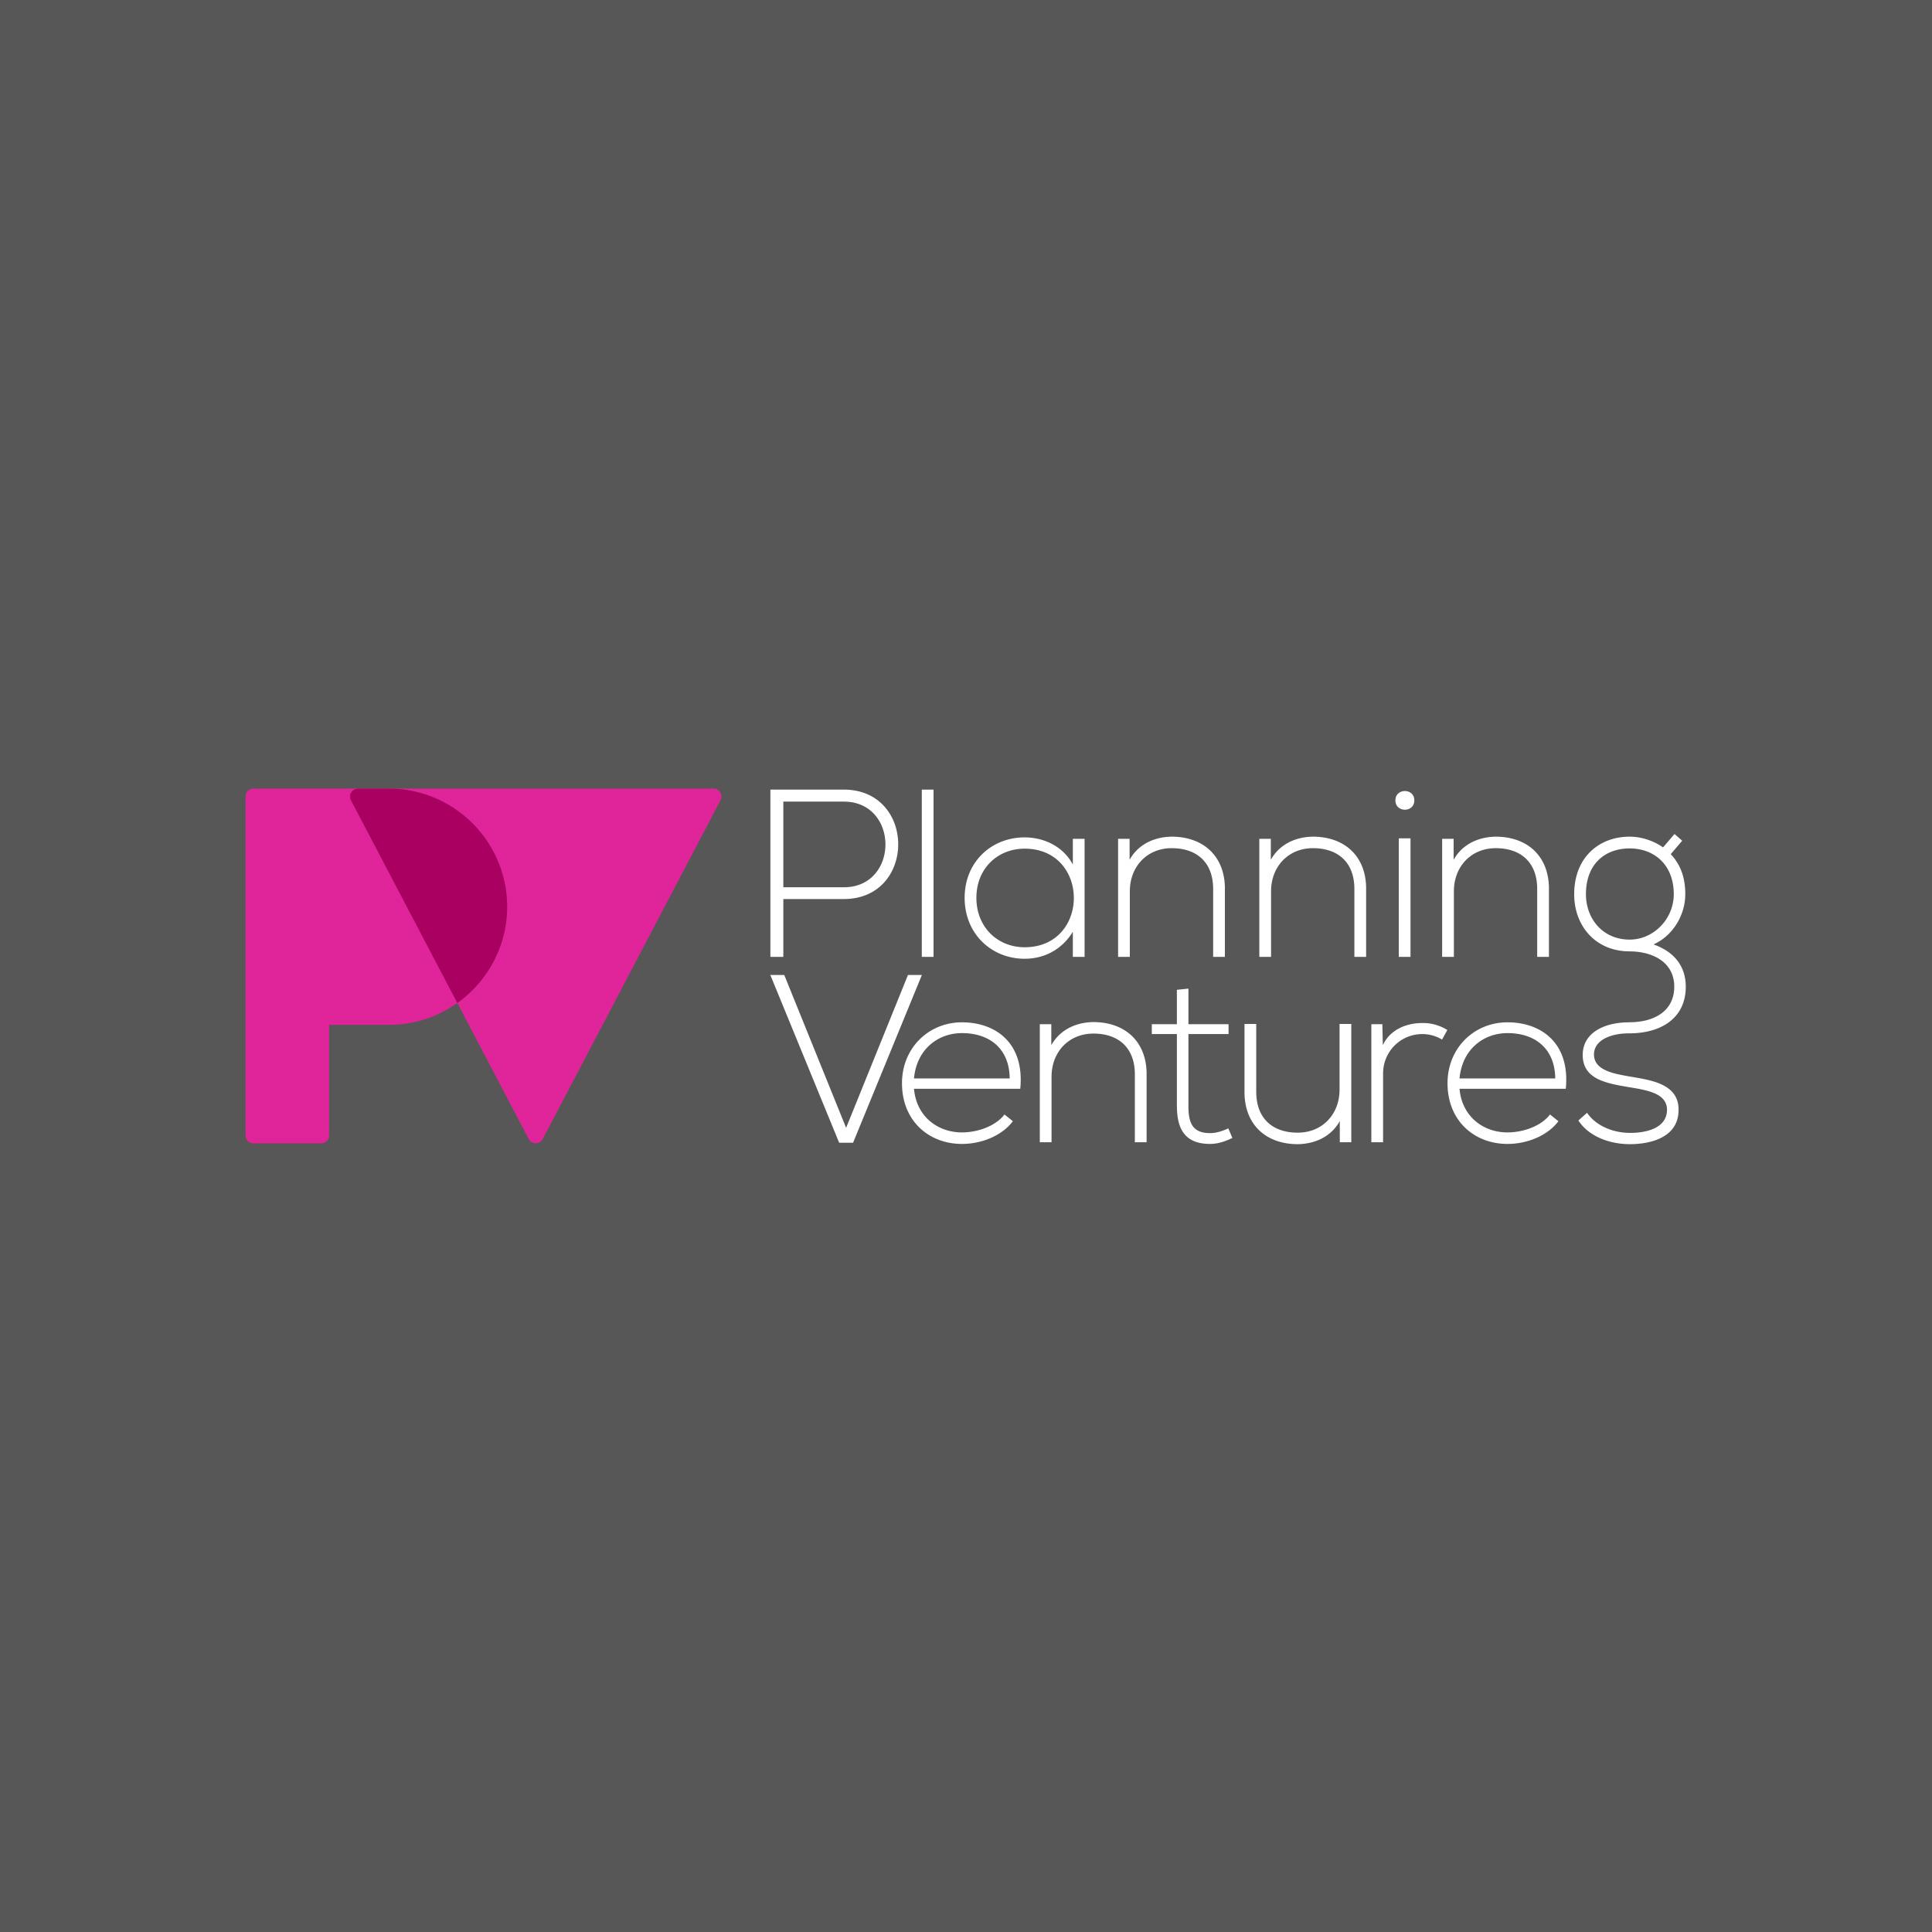 planning ventures brand logo